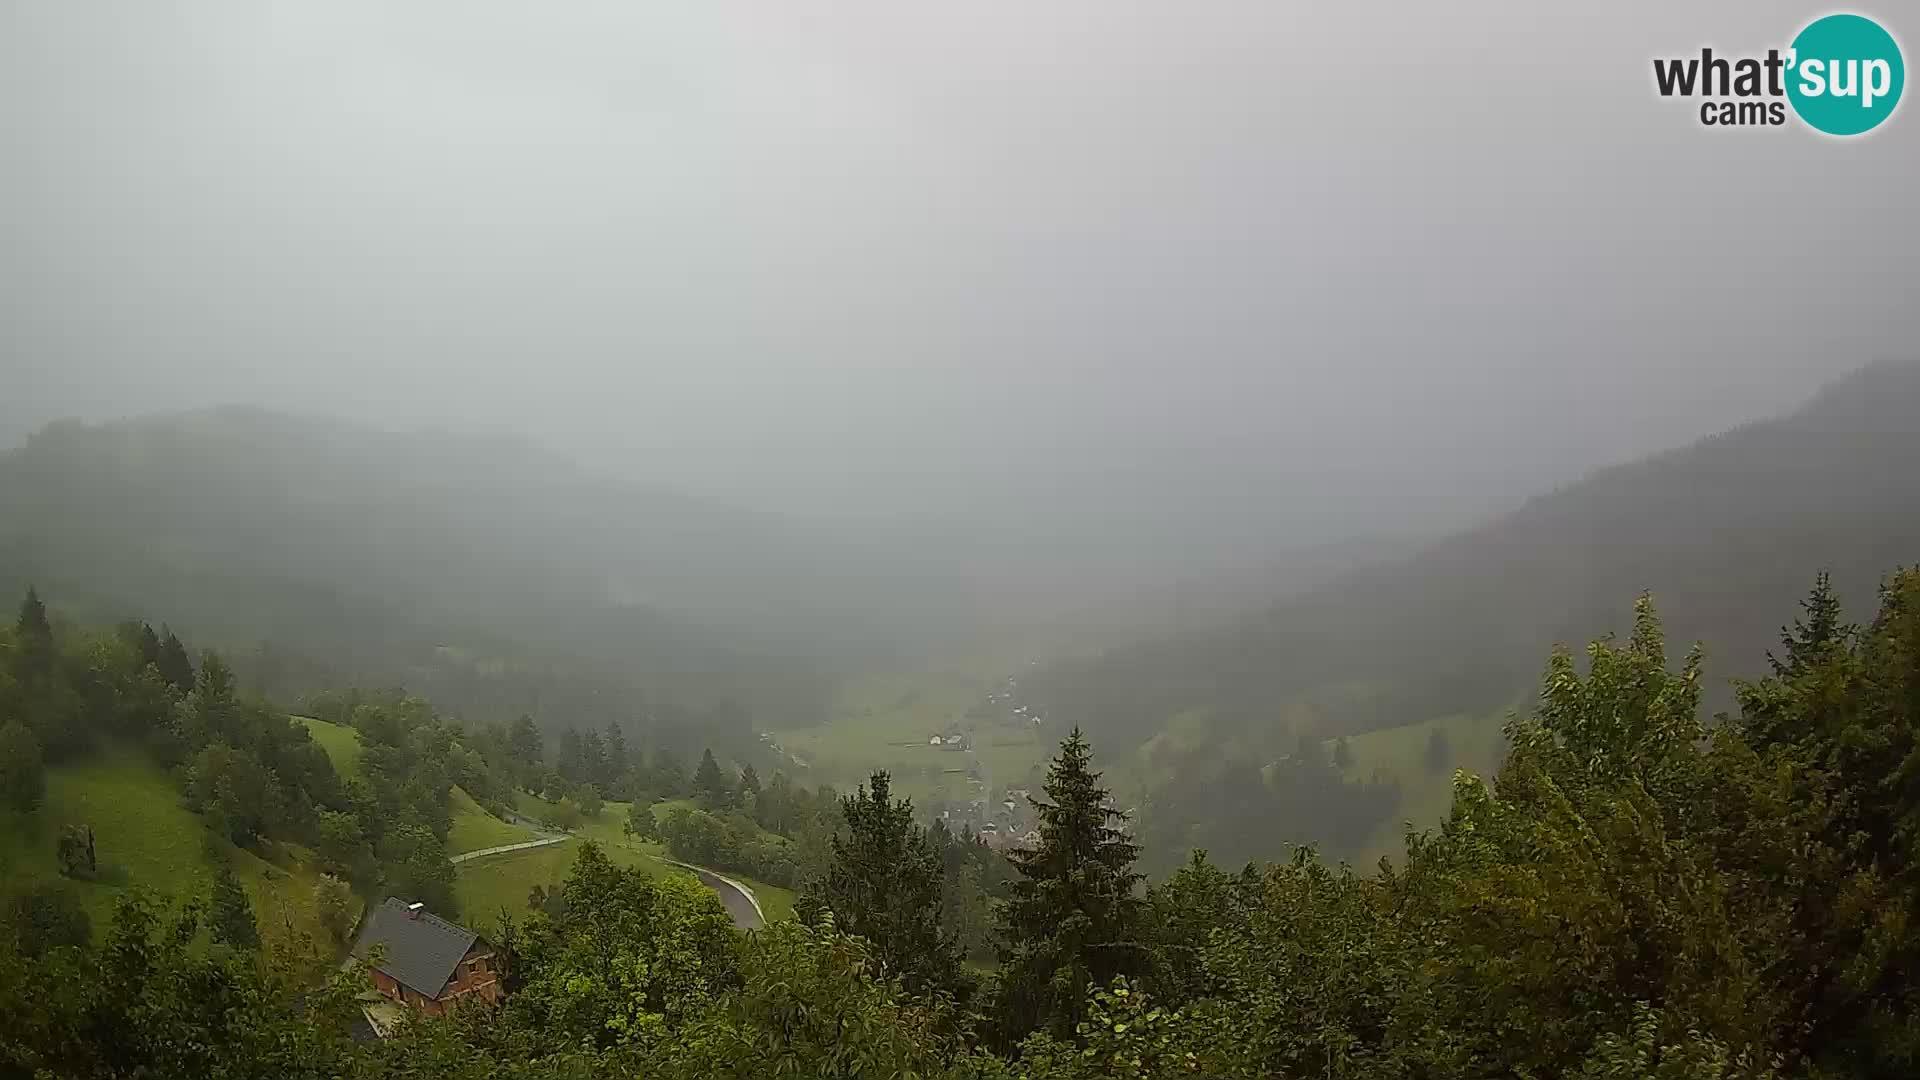 Livecam Dražgoše webcam